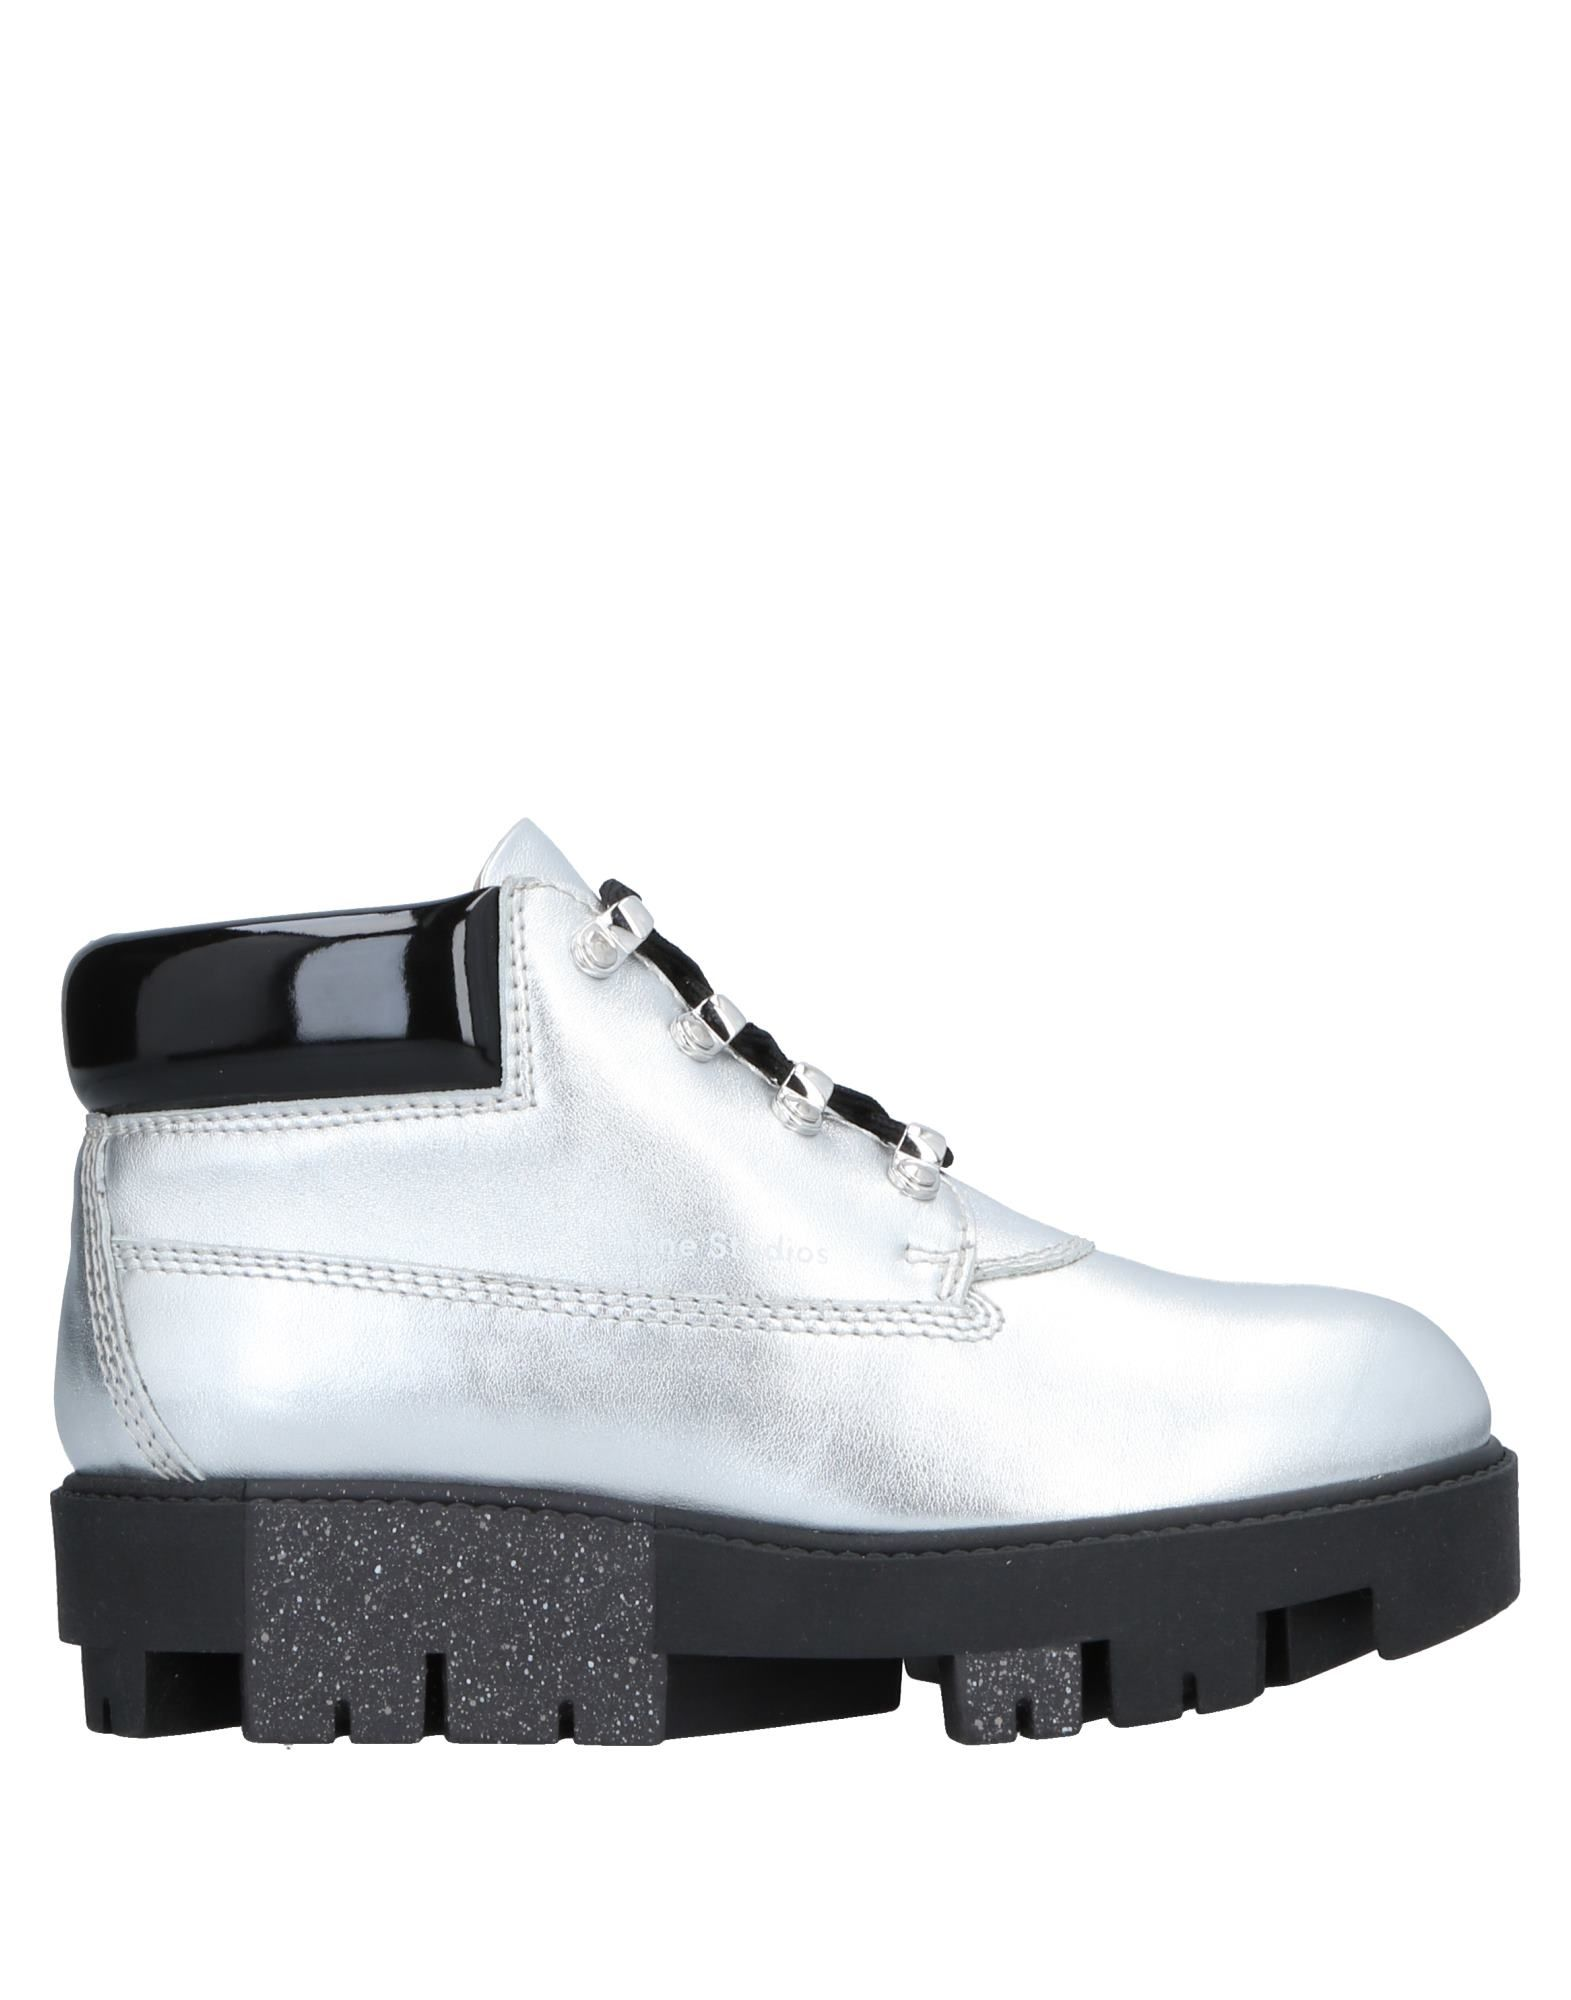 Rabatt Damen Schuhe Acne Studios Sneakers Damen Rabatt  11537393UI 4f4c1c